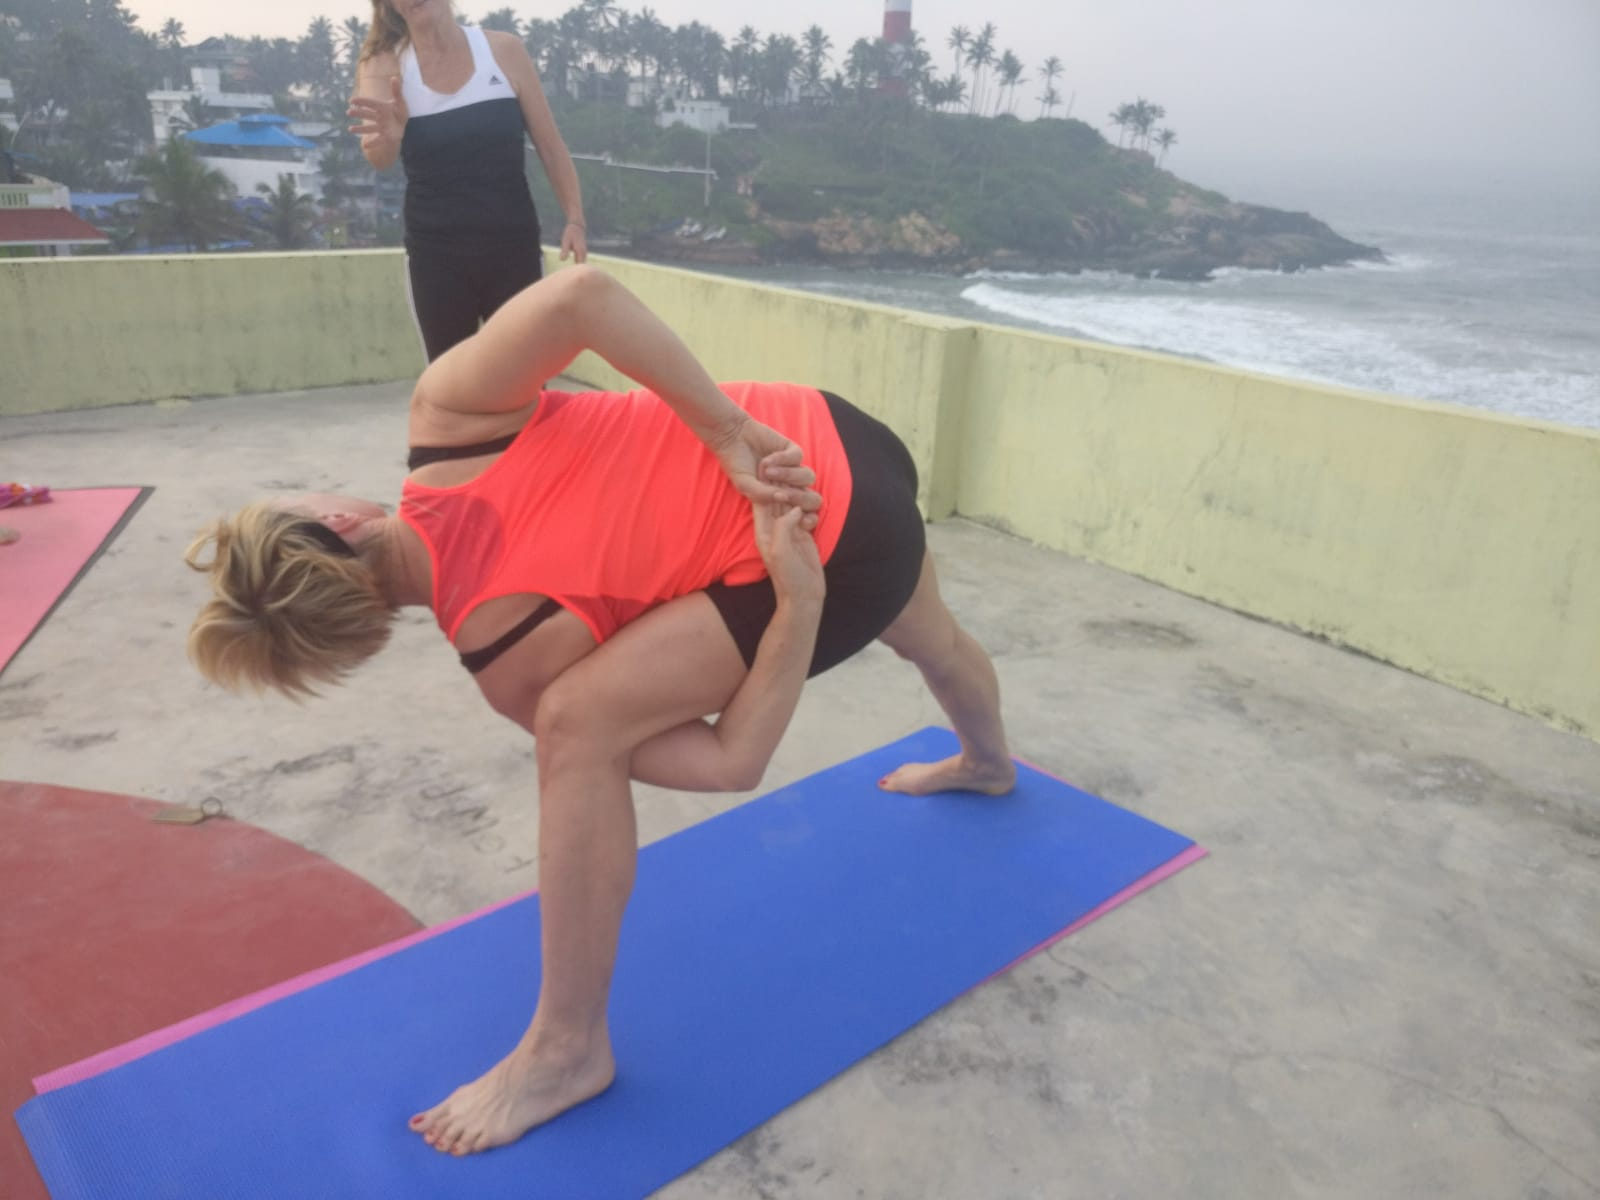 Aldi Kühlschrank Yoga : Yoga im turm.de u2013 yoga mit erika im turmzimmer im marienbachzentrum